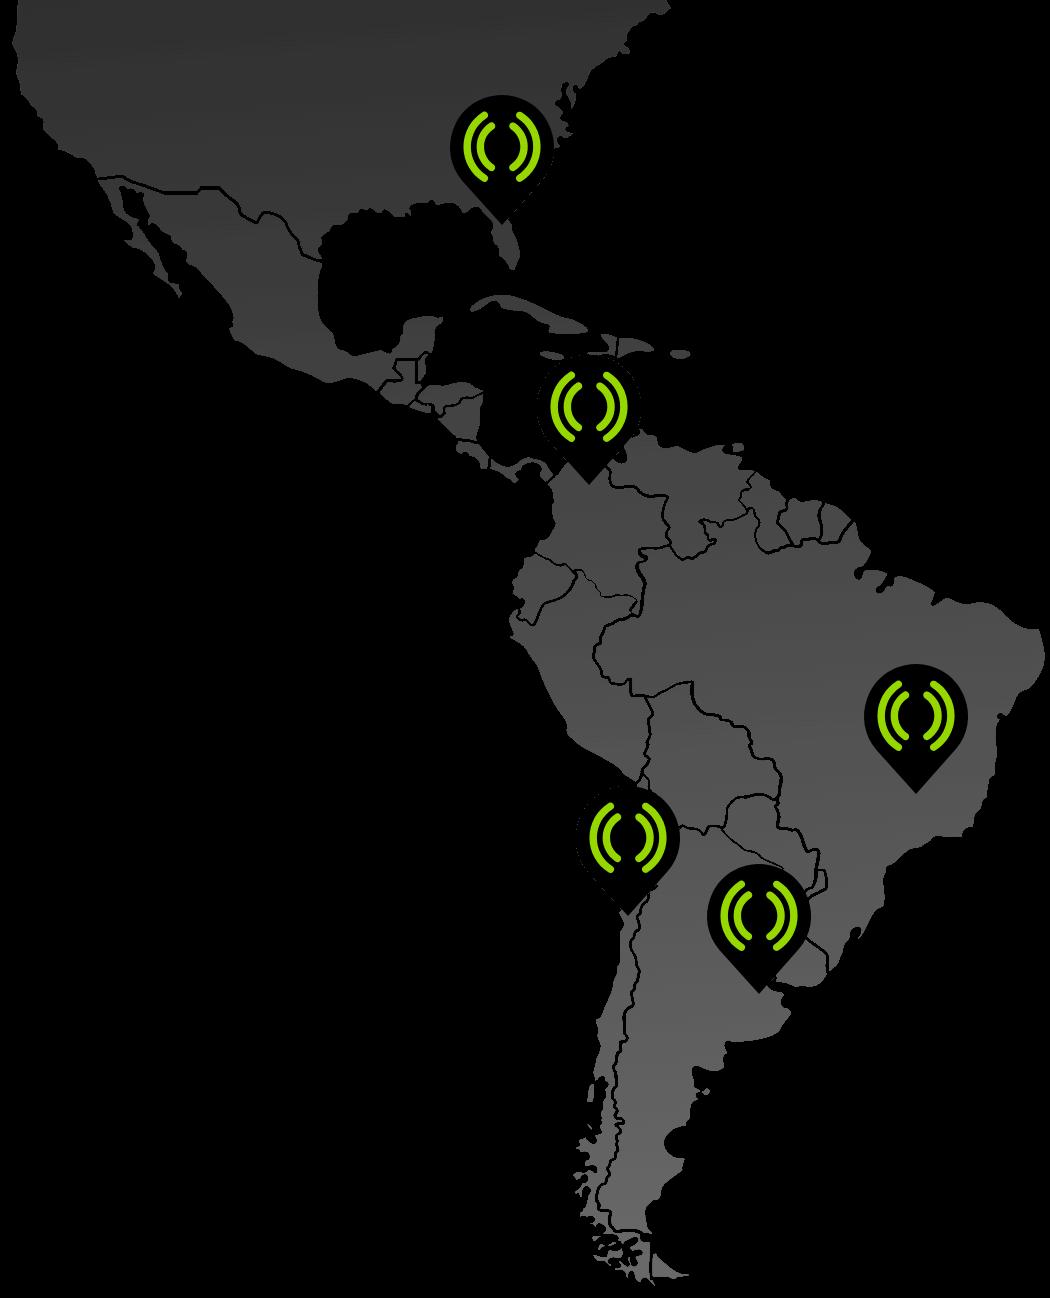 Mediastream's offices map